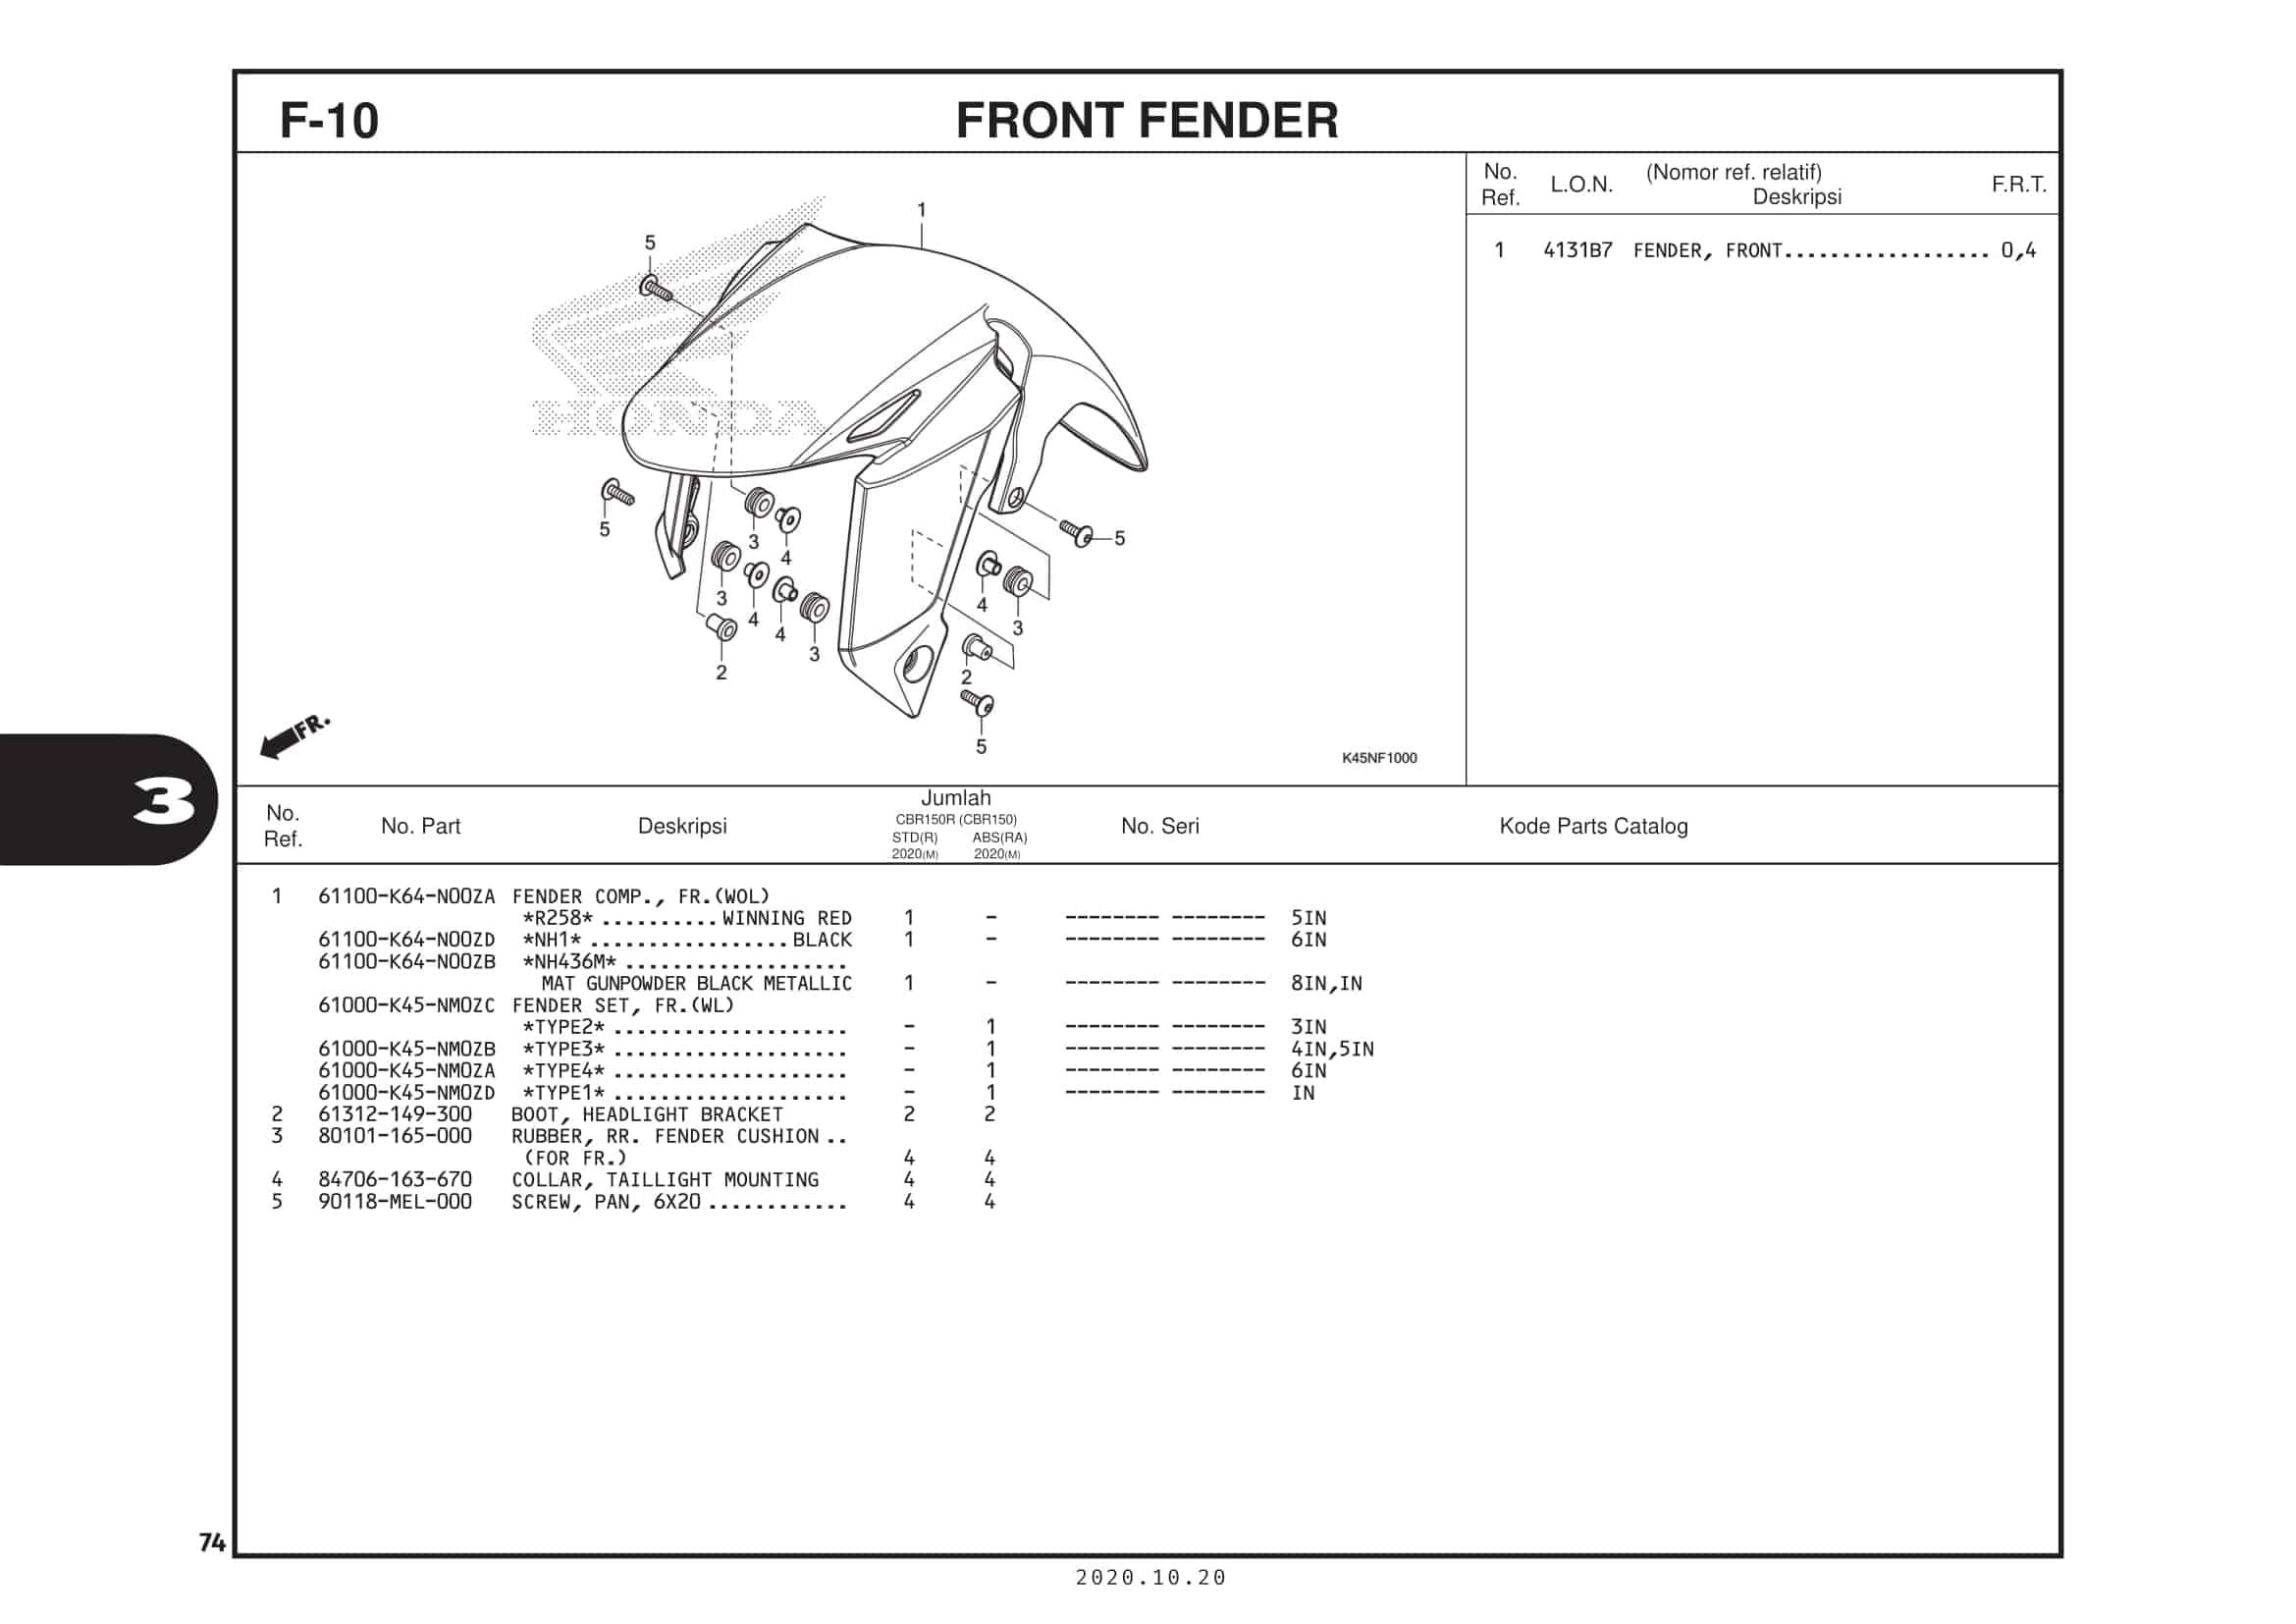 F-10 Front Fender